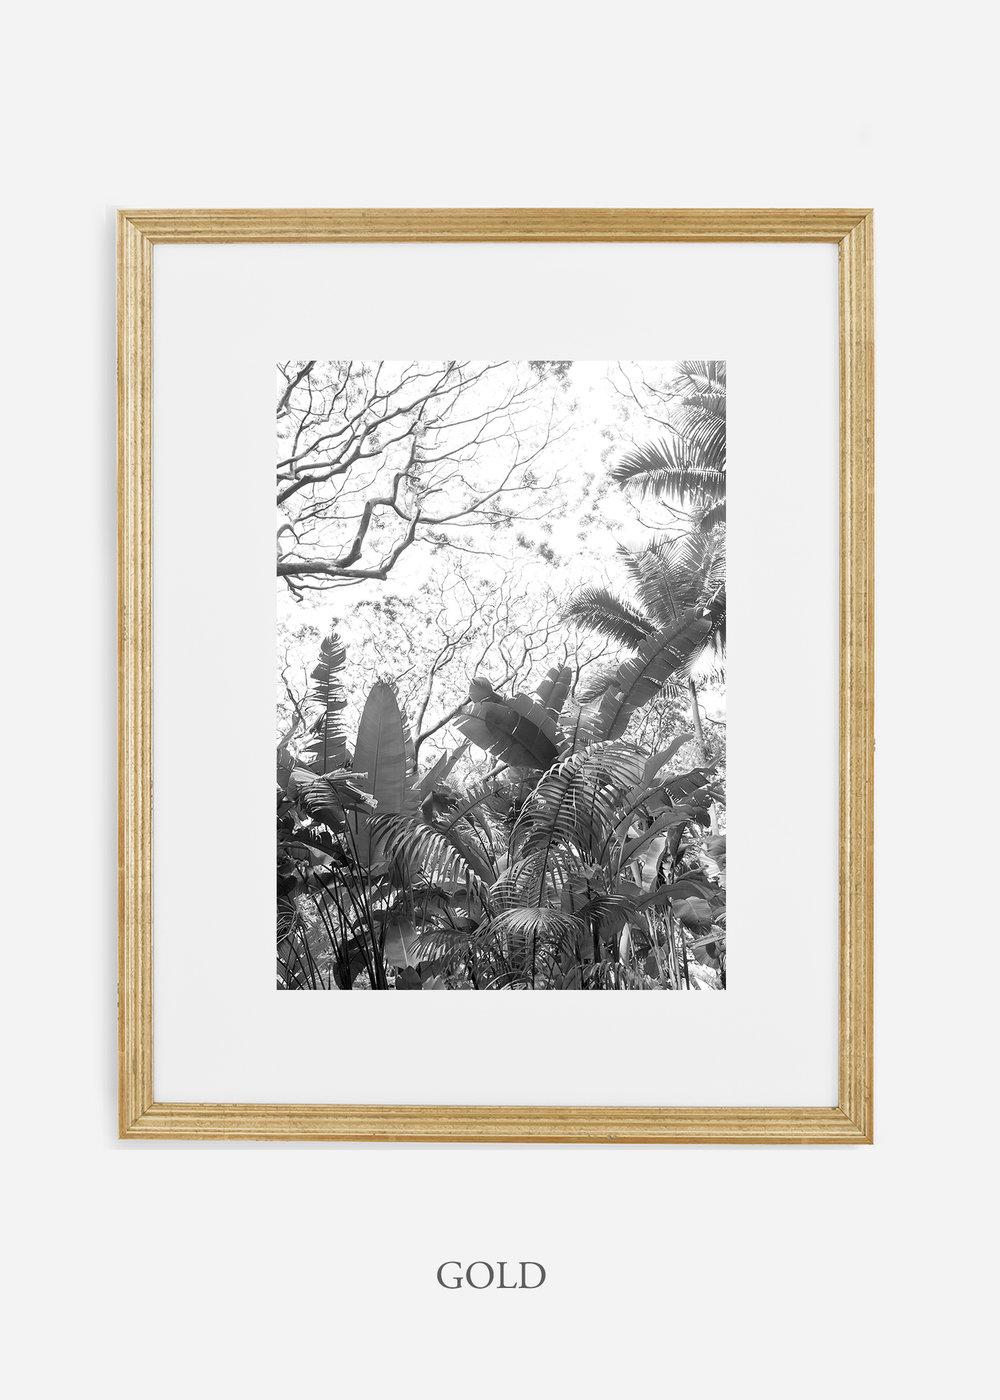 tropicaldecor_WilderCalifornia_TropicalRainforest2_Art_Photography_interiordesign_goldframe.jpg